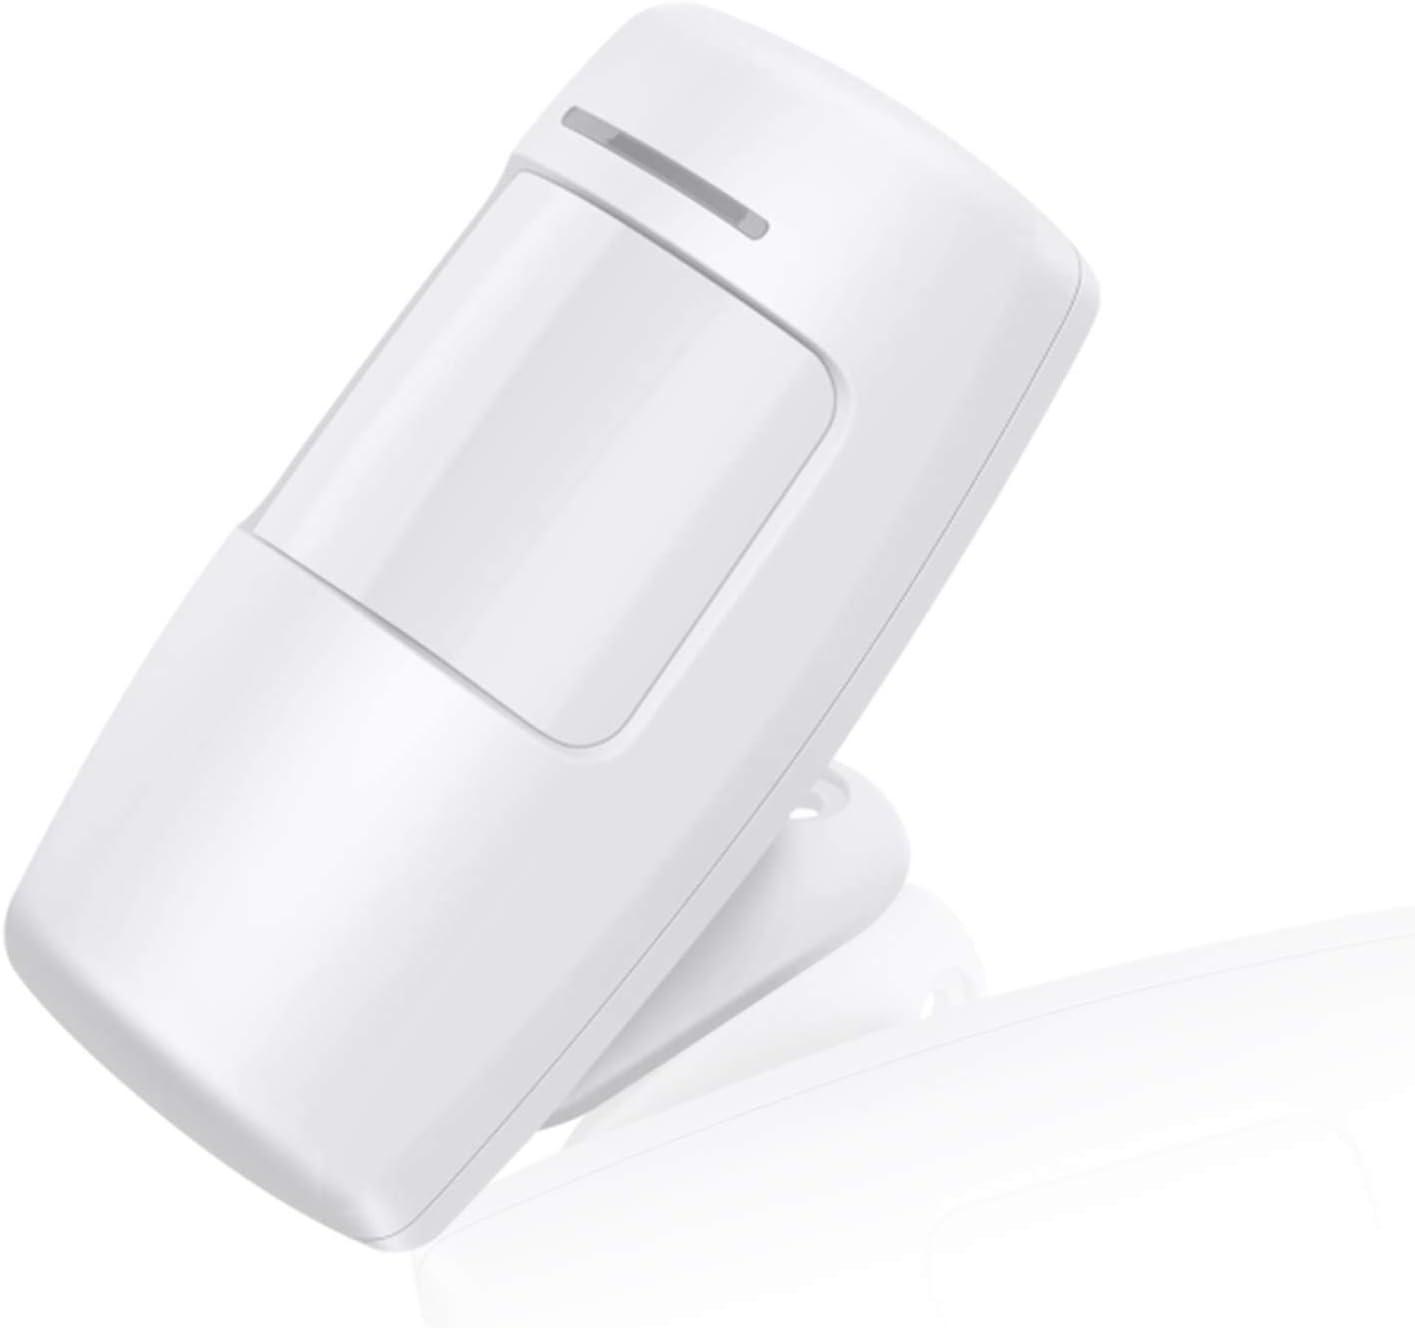 tolviviov Motion Sensor - Compatible with tolviviov Home Alarm System-HUB Needed